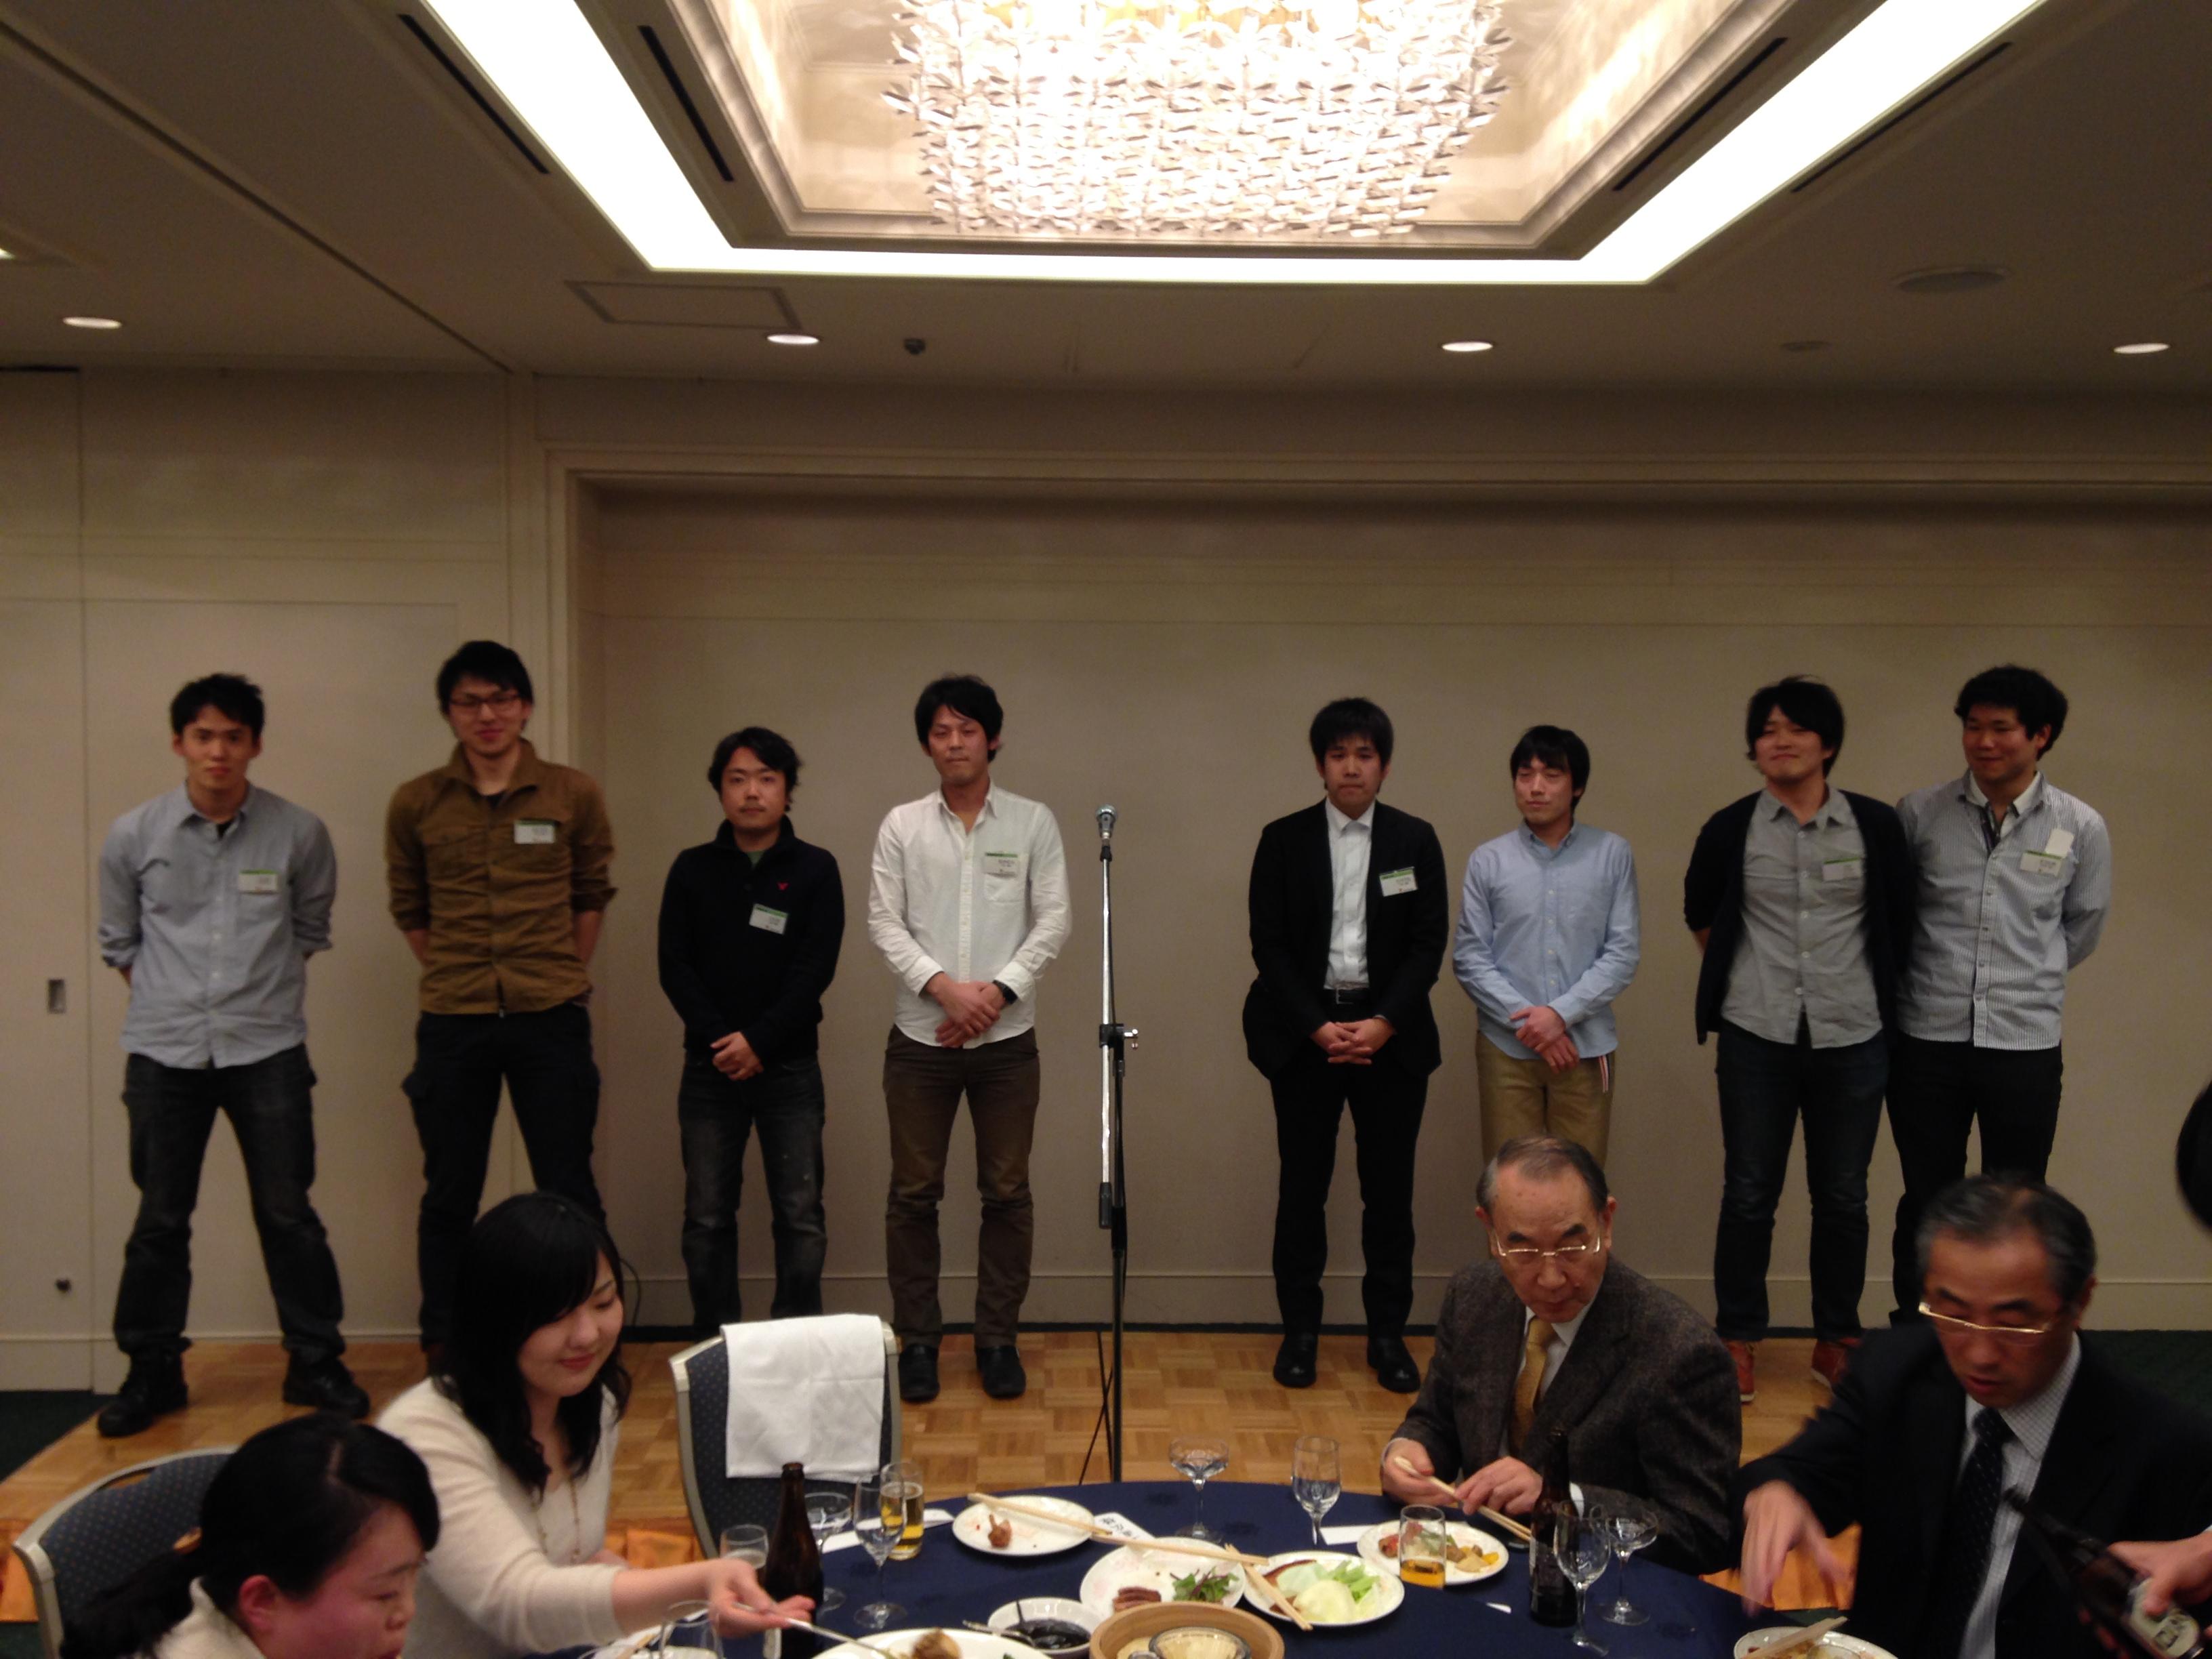 http://blog.higashi-tokushukai.or.jp/ydblog/%E5%86%99%E7%9C%9F%203.JPG